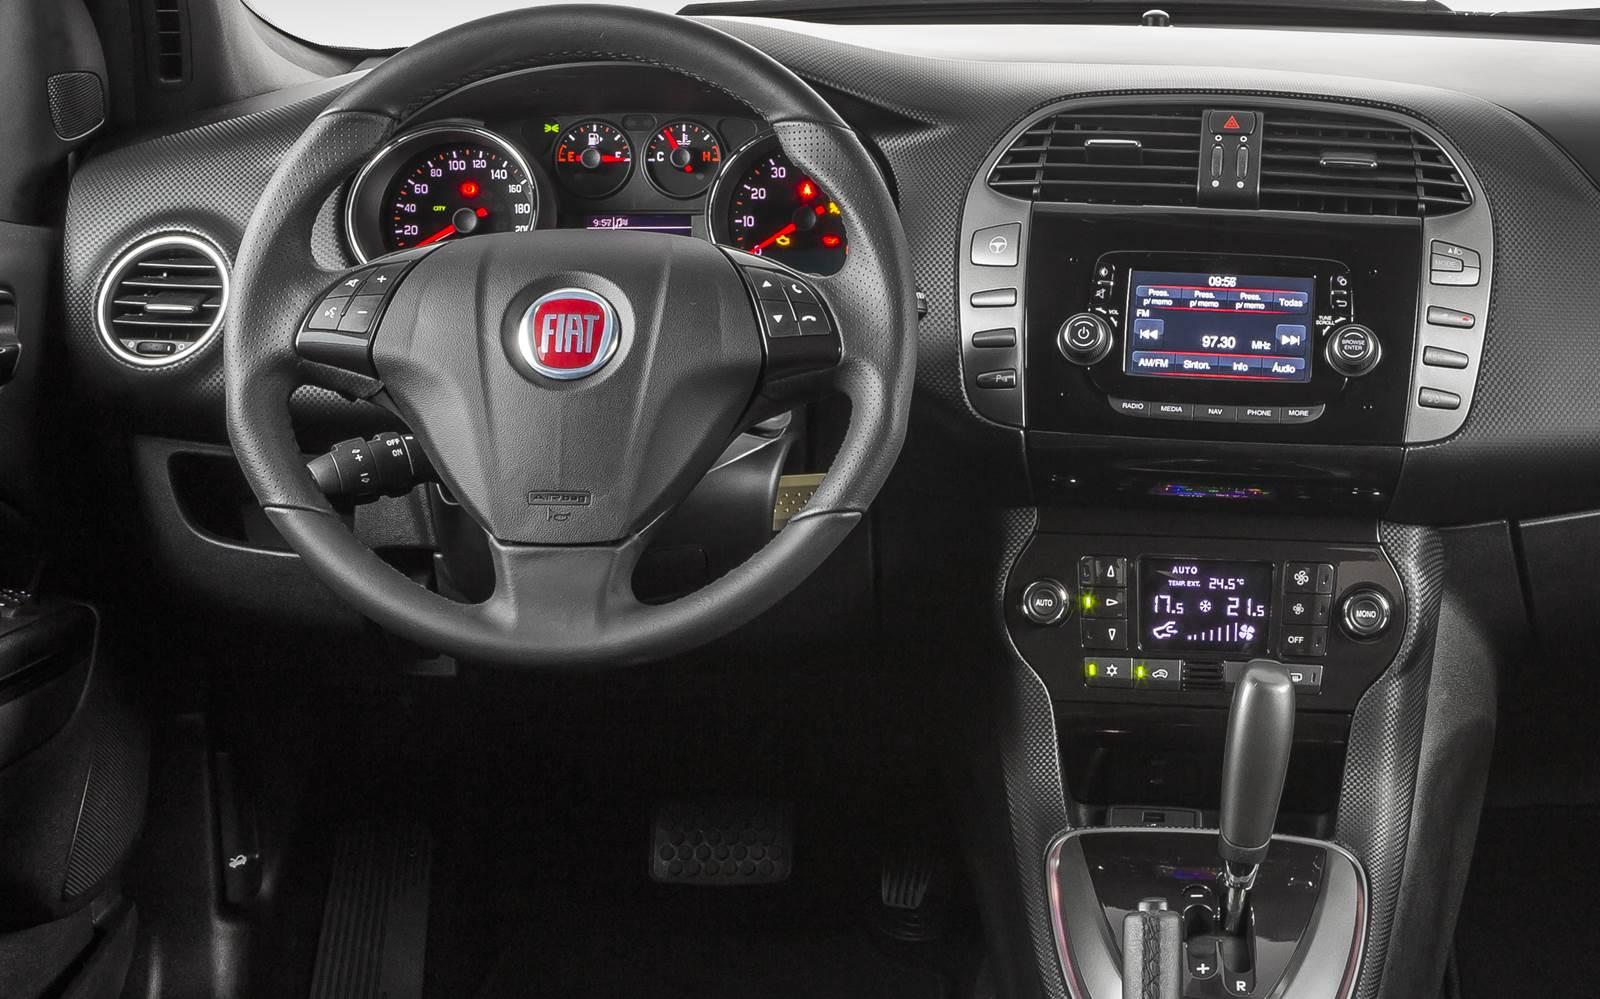 Fiat Bravo Blackmotion 2016 - painel